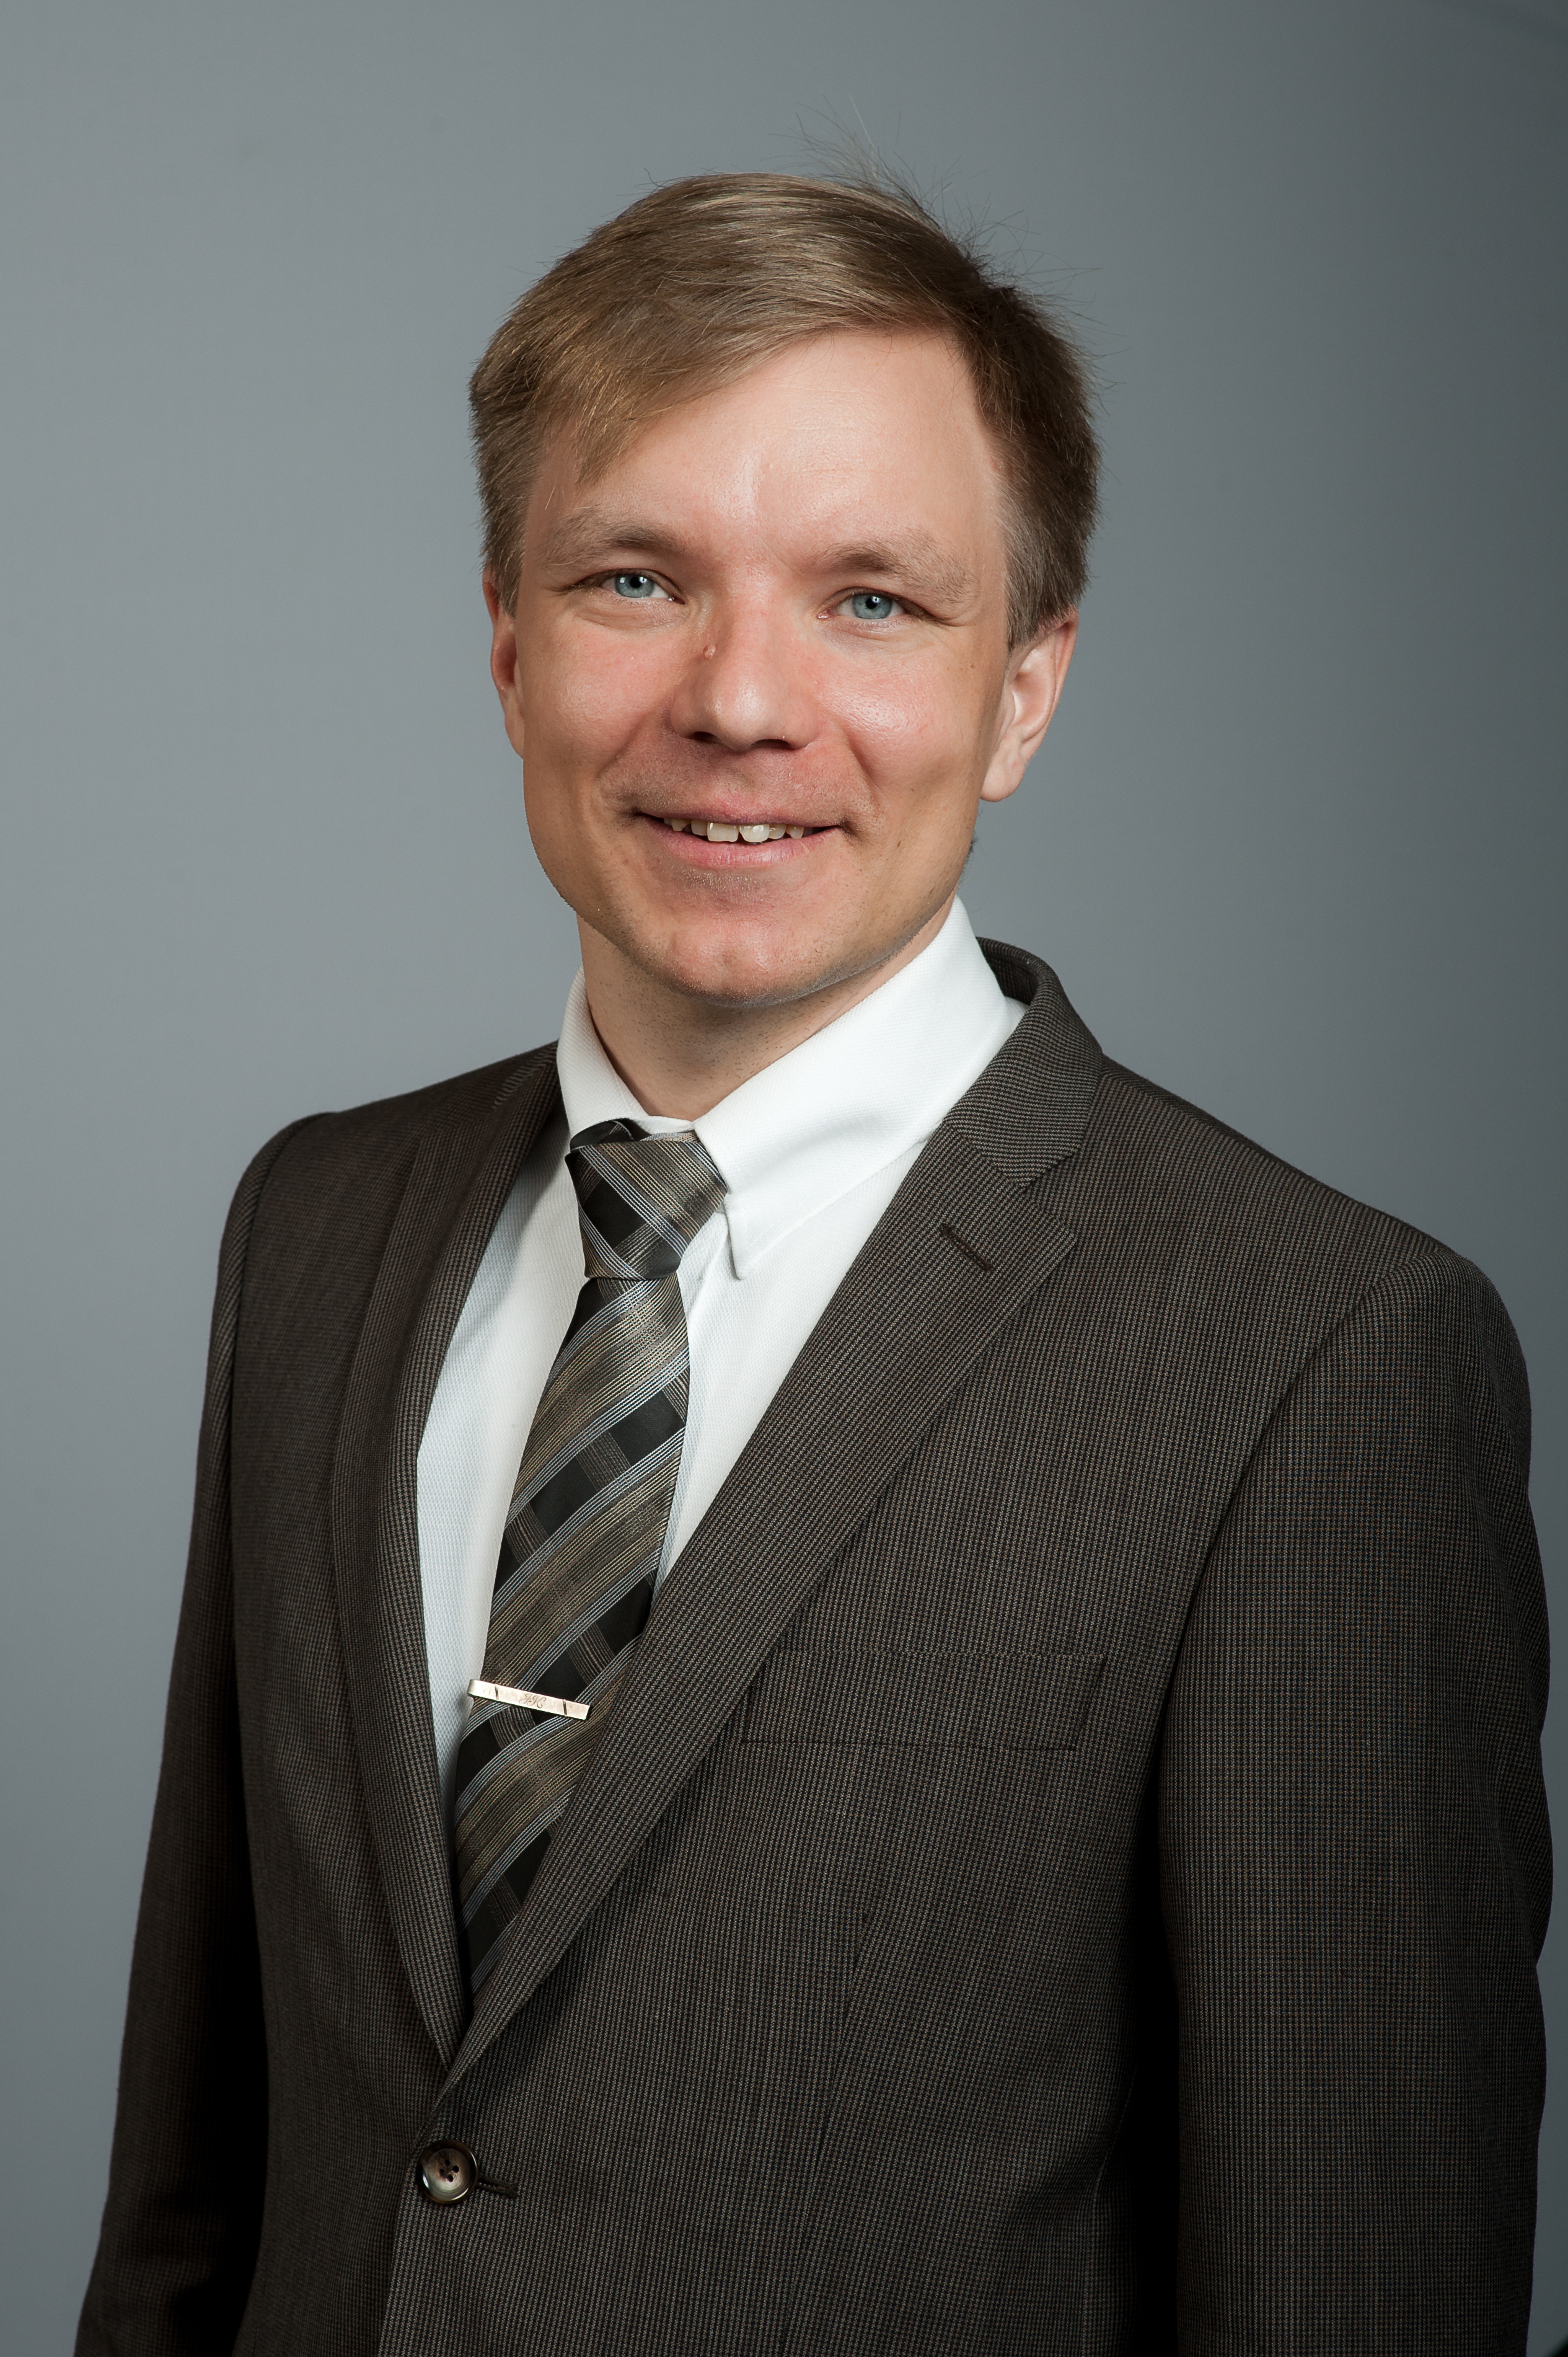 Johannes Kangas